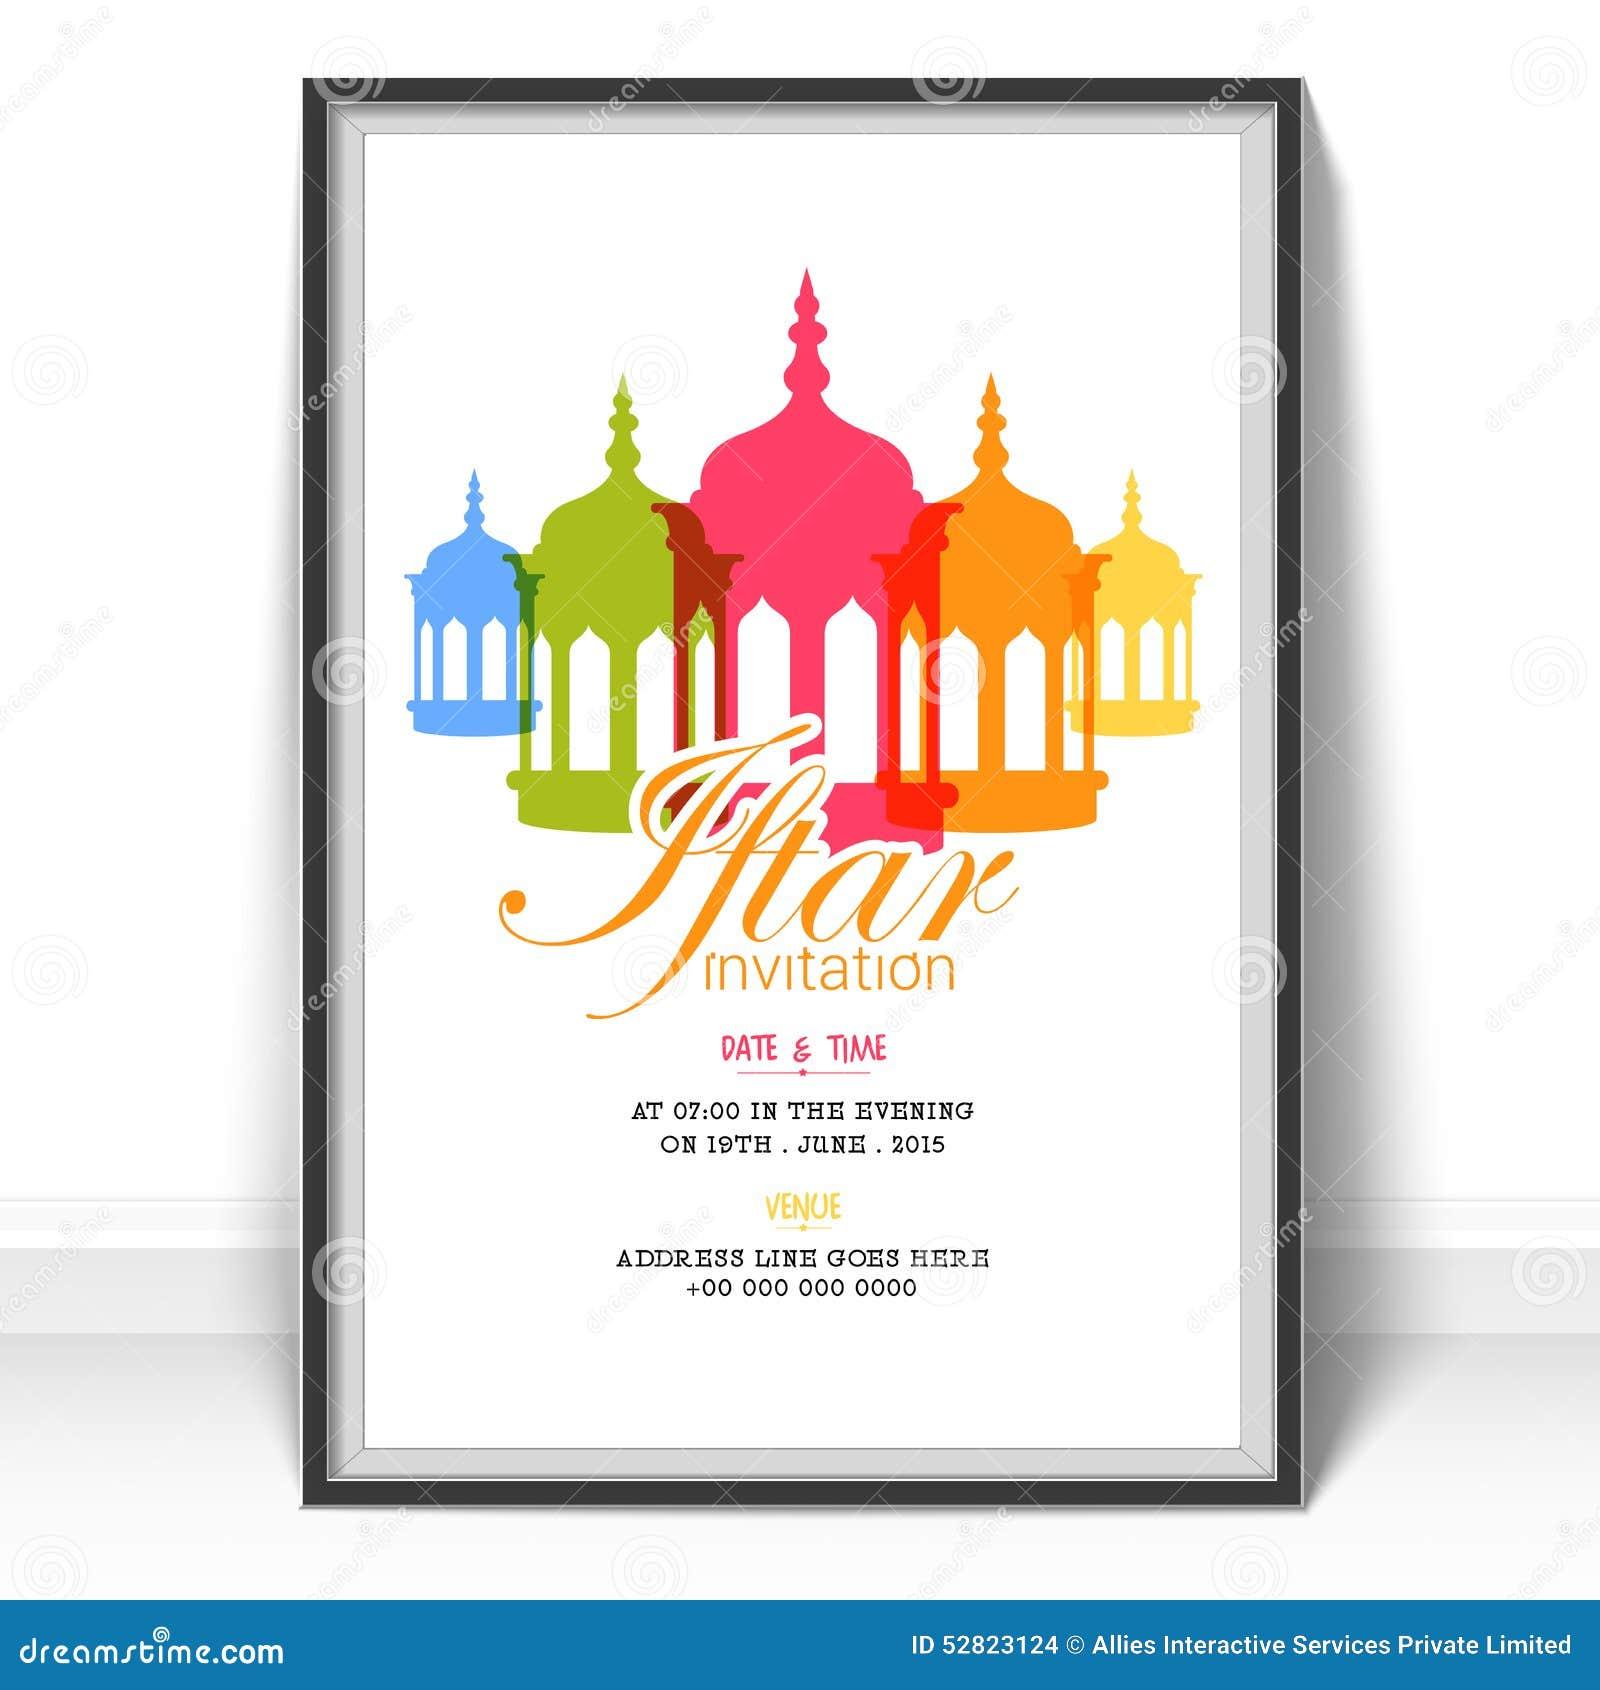 Iftar stock illustrations 3010 iftar stock illustrations vectors beautiful invitation card for ramadan kareem iftar party celebration holy month of muslim community stopboris Choice Image